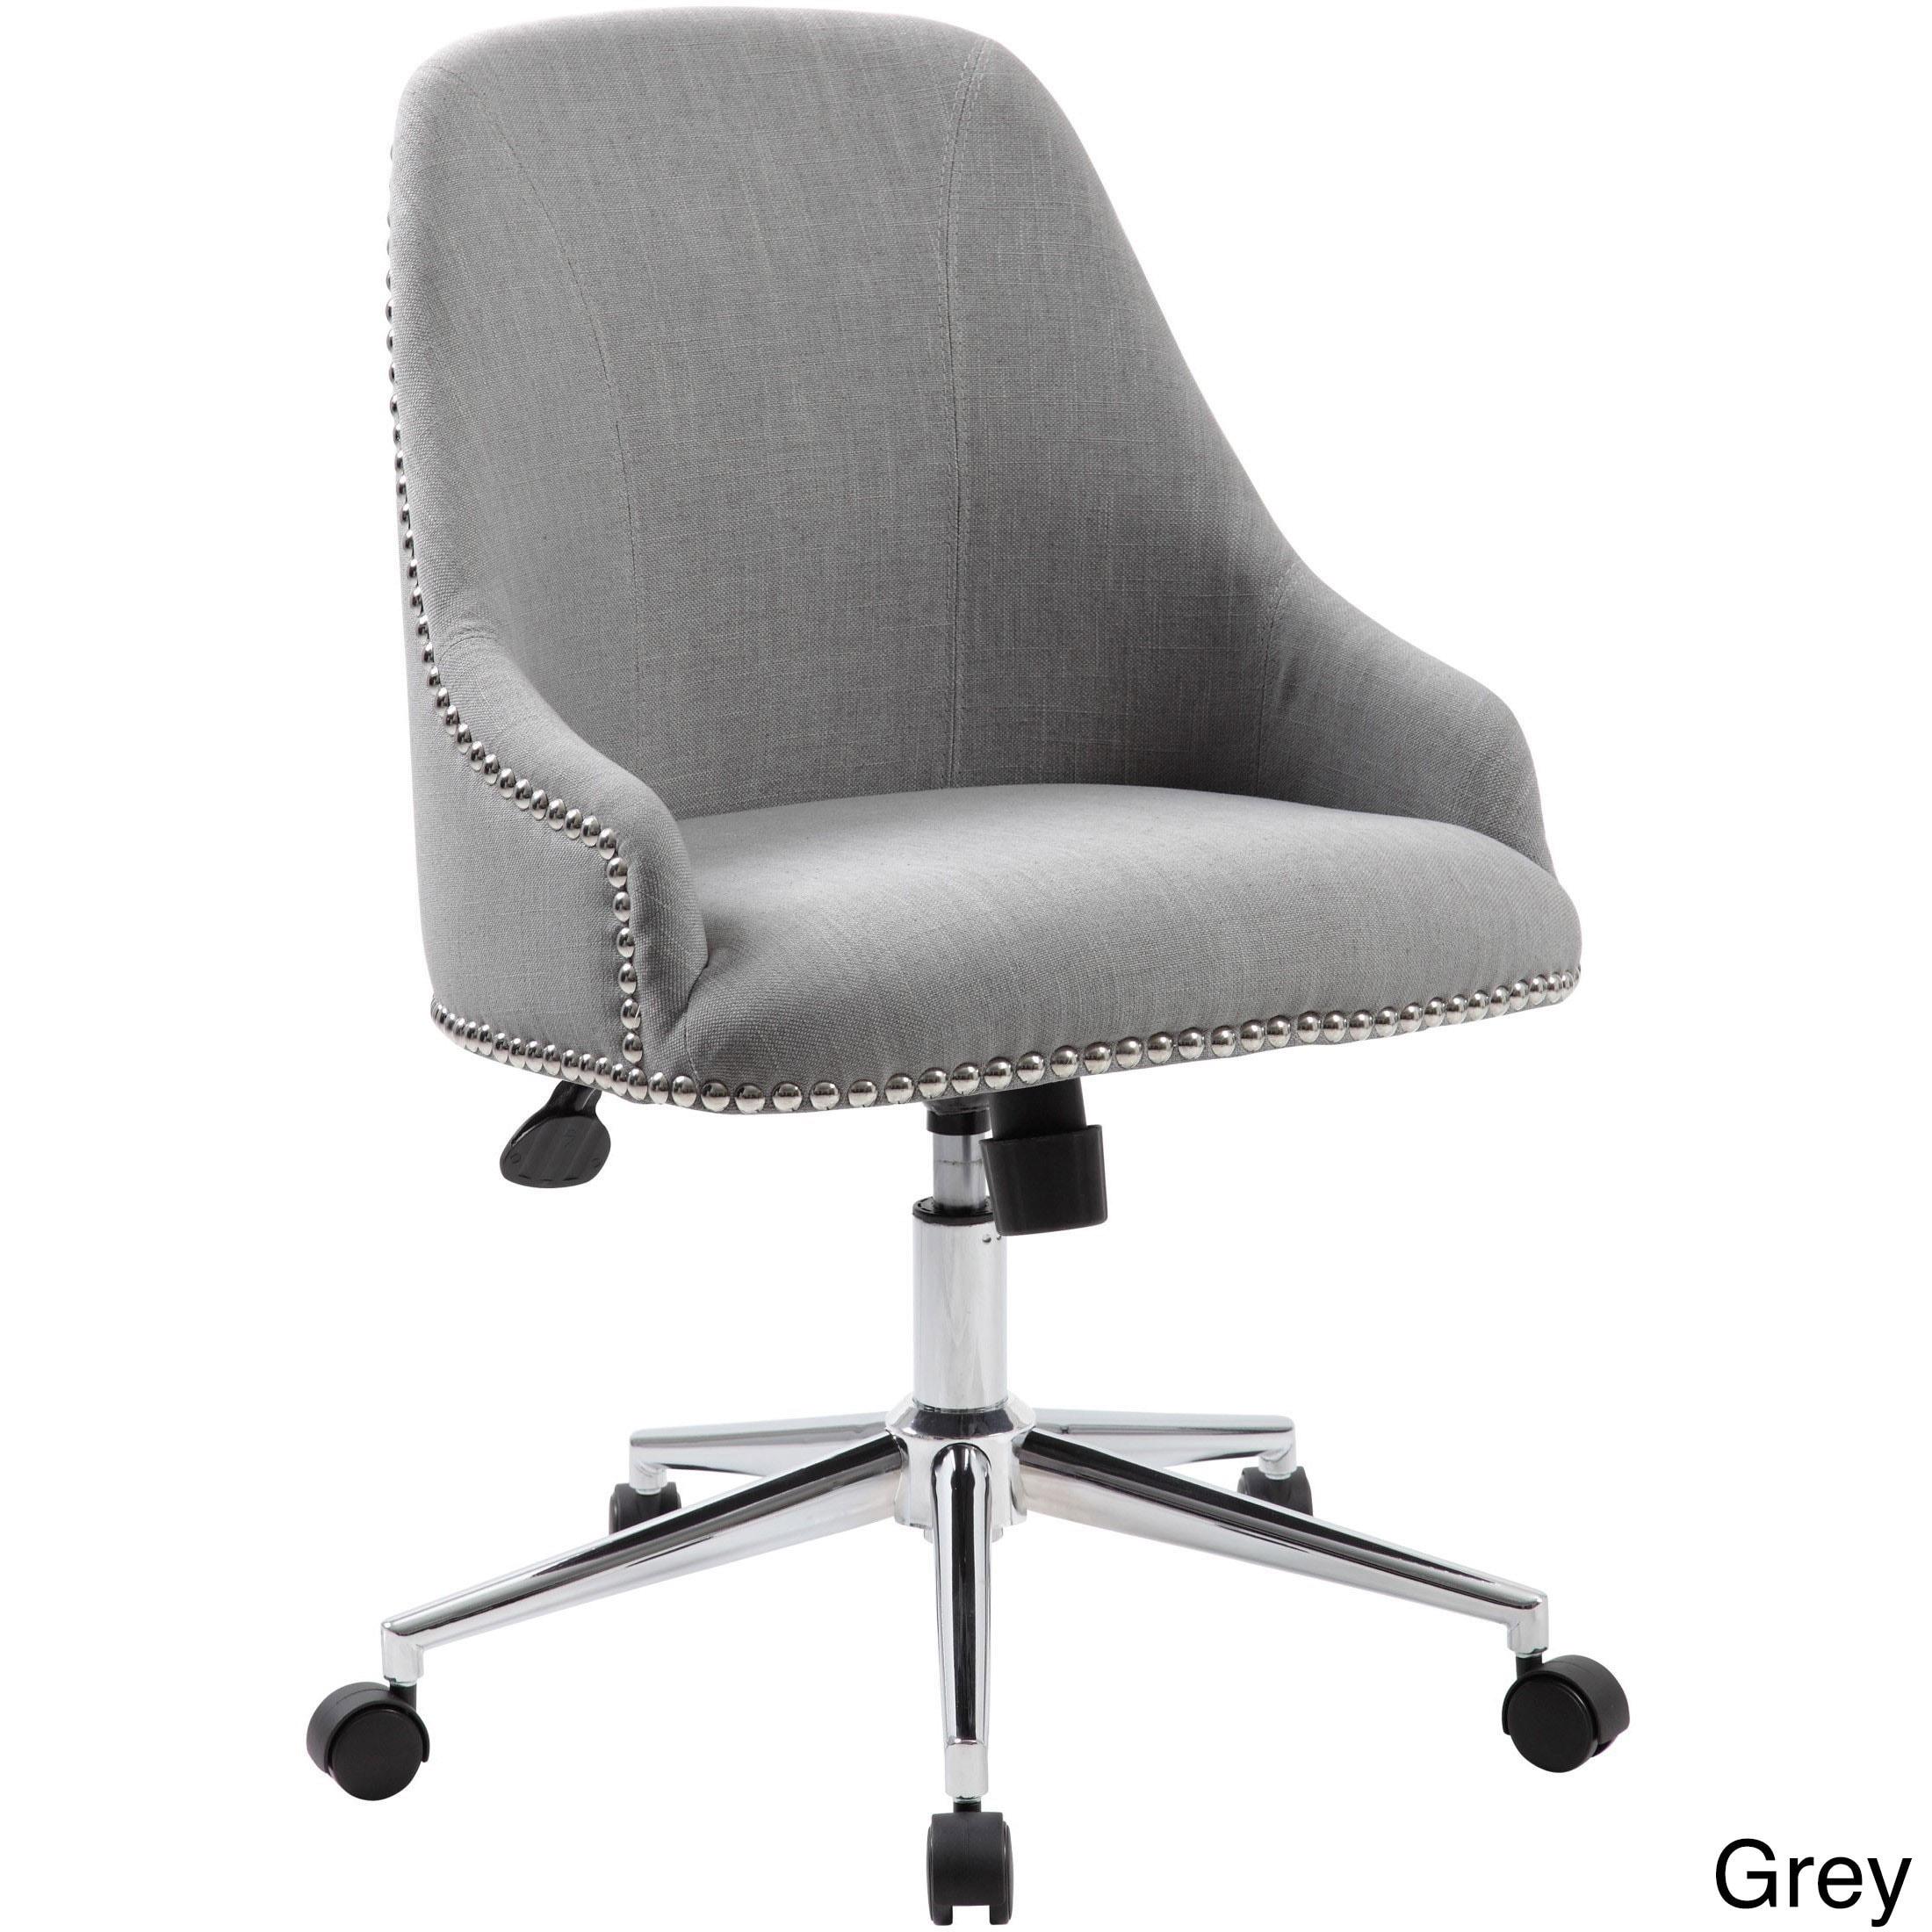 black desk chair. Boss Carnegie Desk Chair - Free Shipping Today Overstock.com 17356434 Black